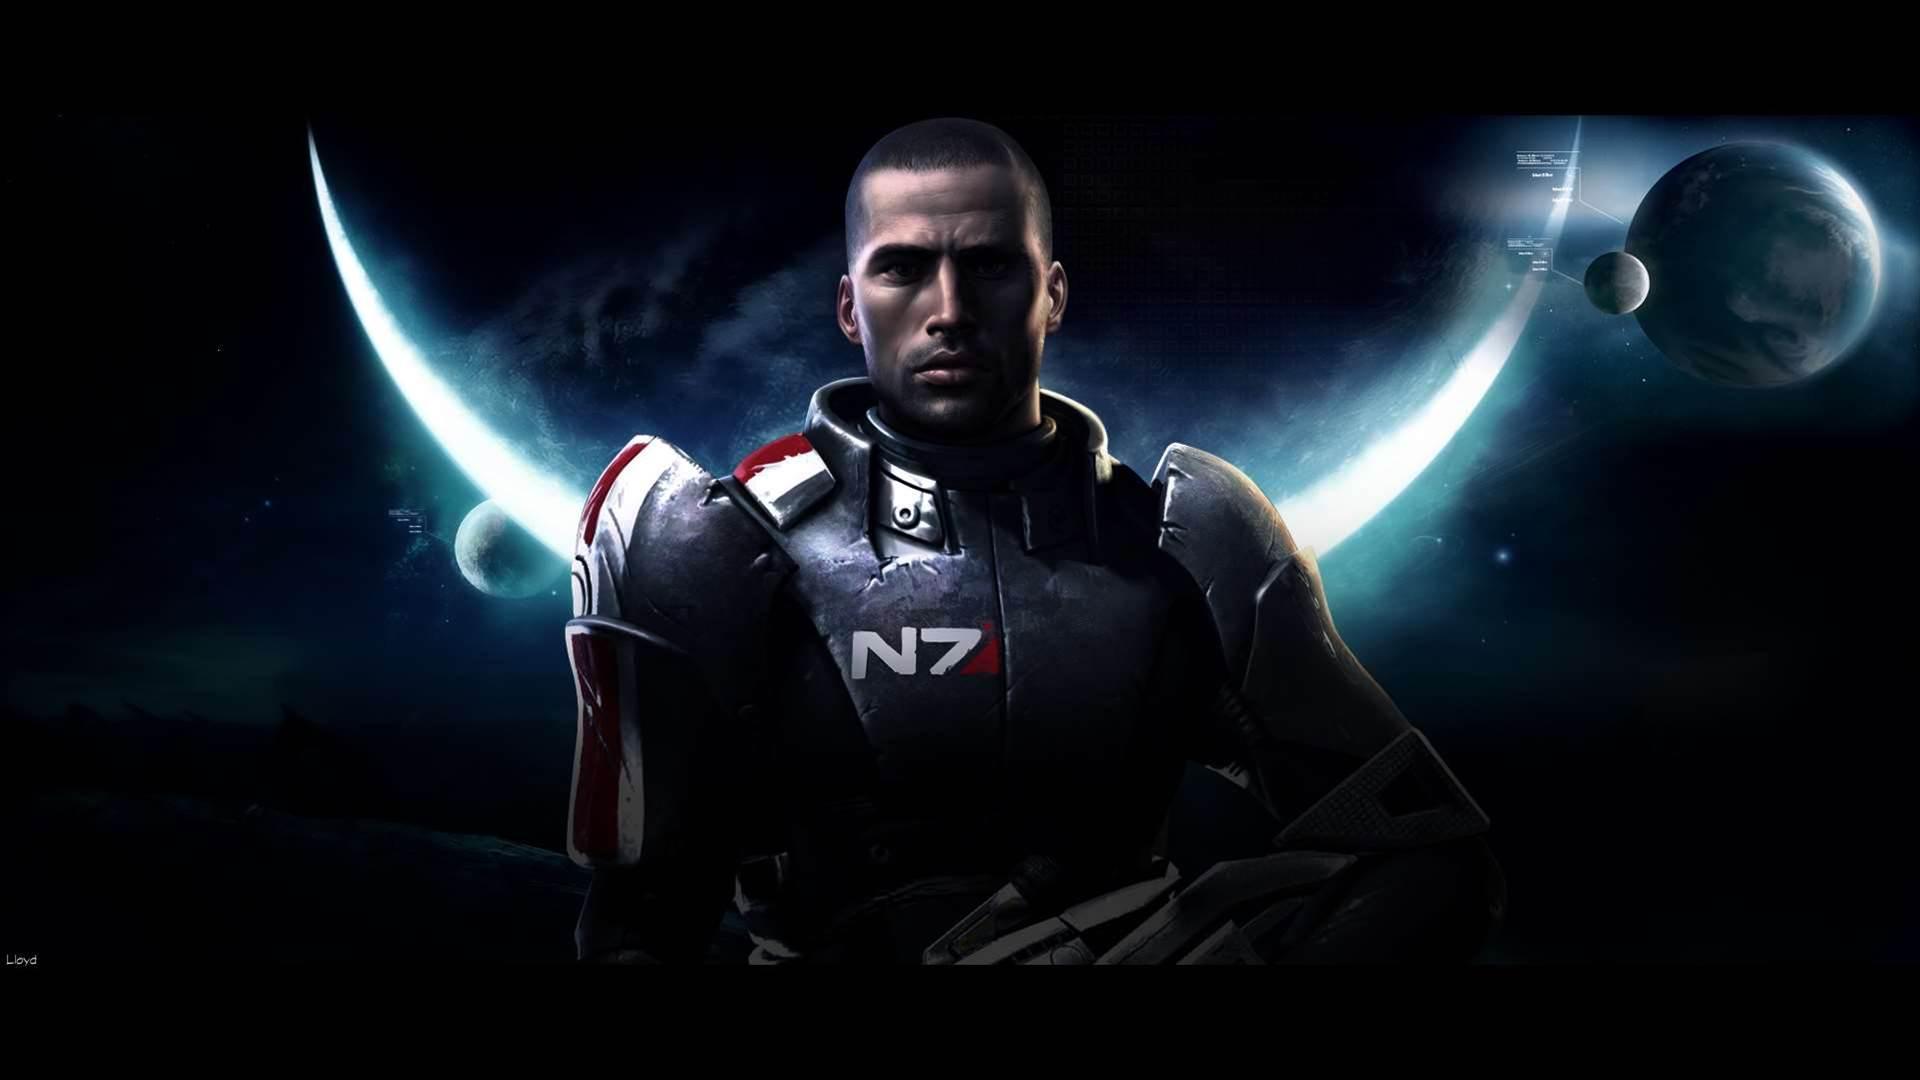 How to make Mass Effect 3 - hands-on + interviews